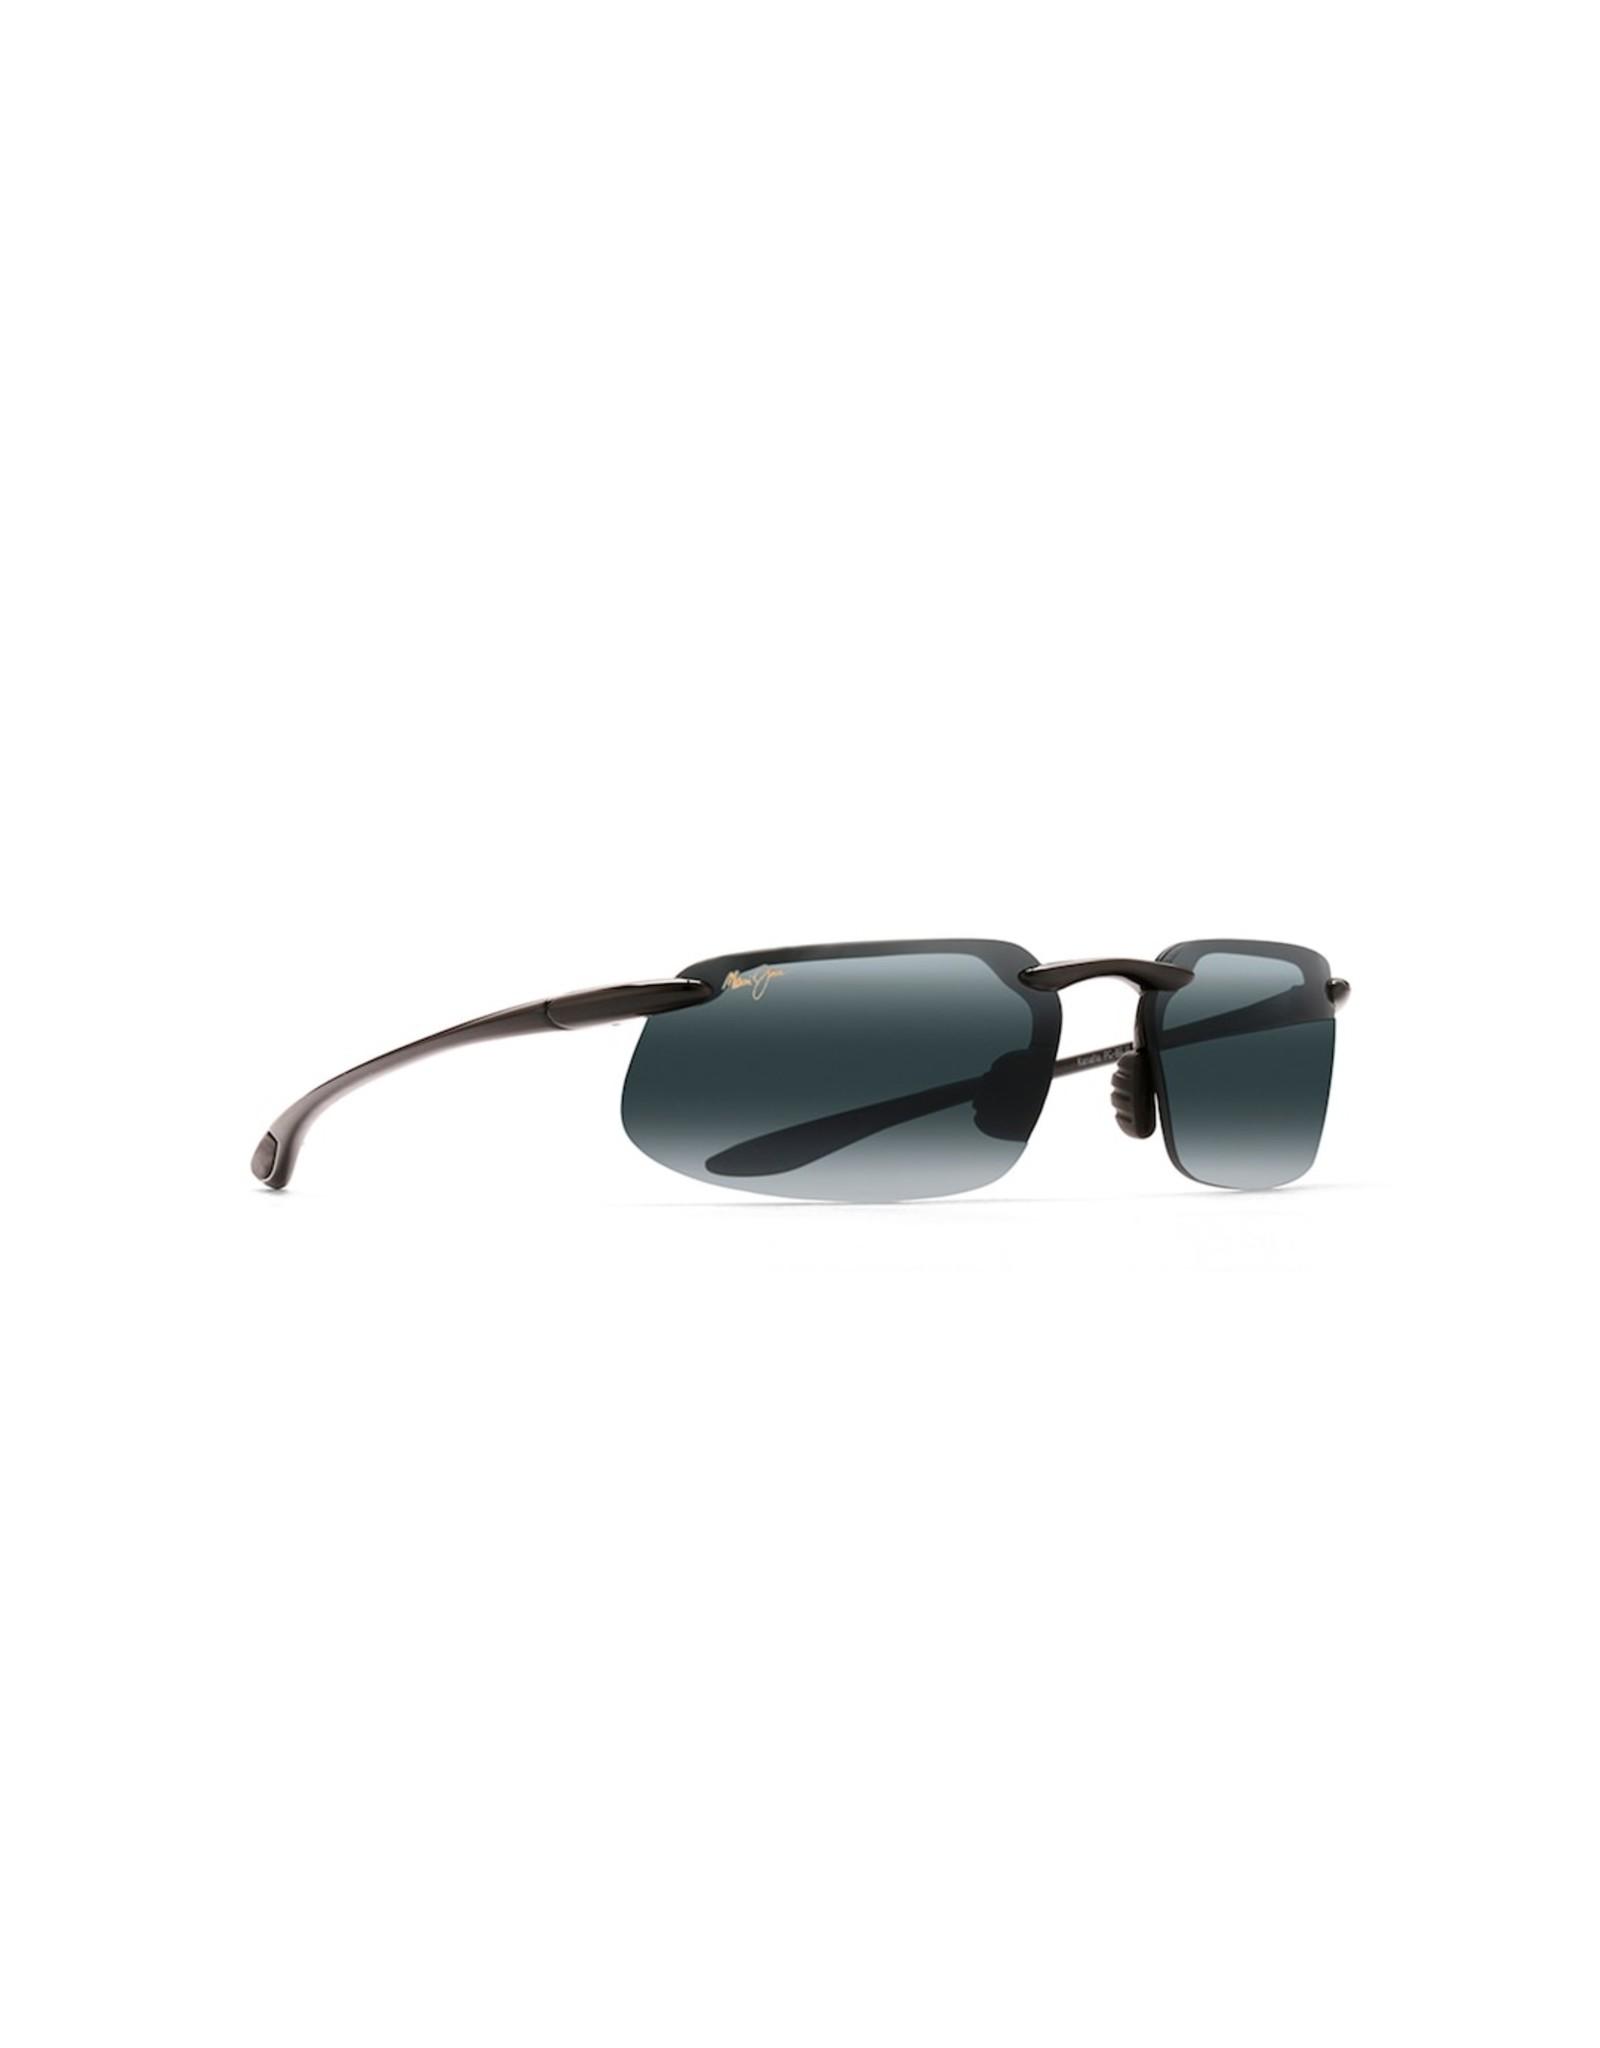 Maui Jim Maui Jim 'Kanaha' Universal Fit Sunglasses